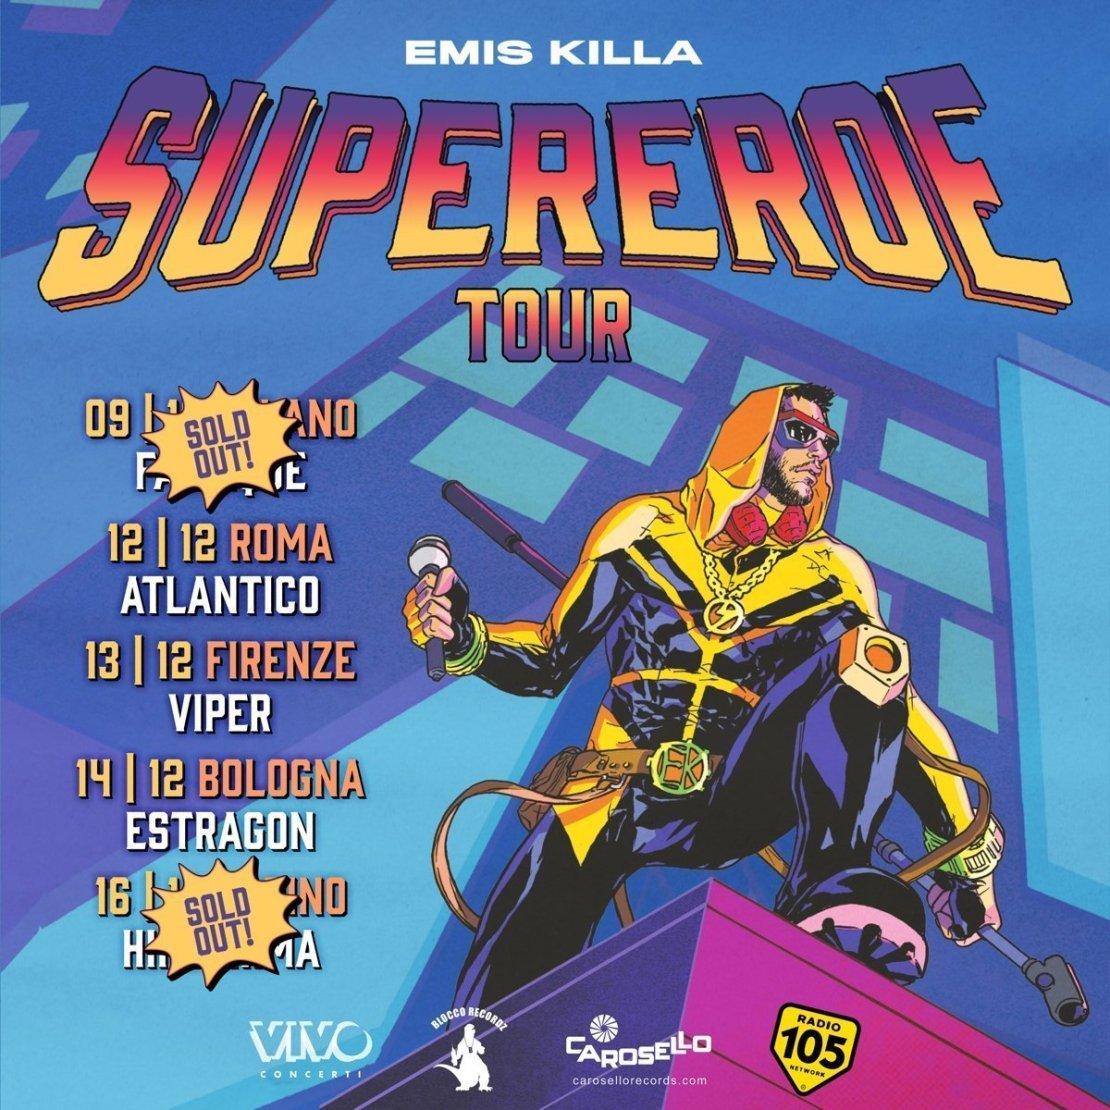 Emis Killa – Superhero tour